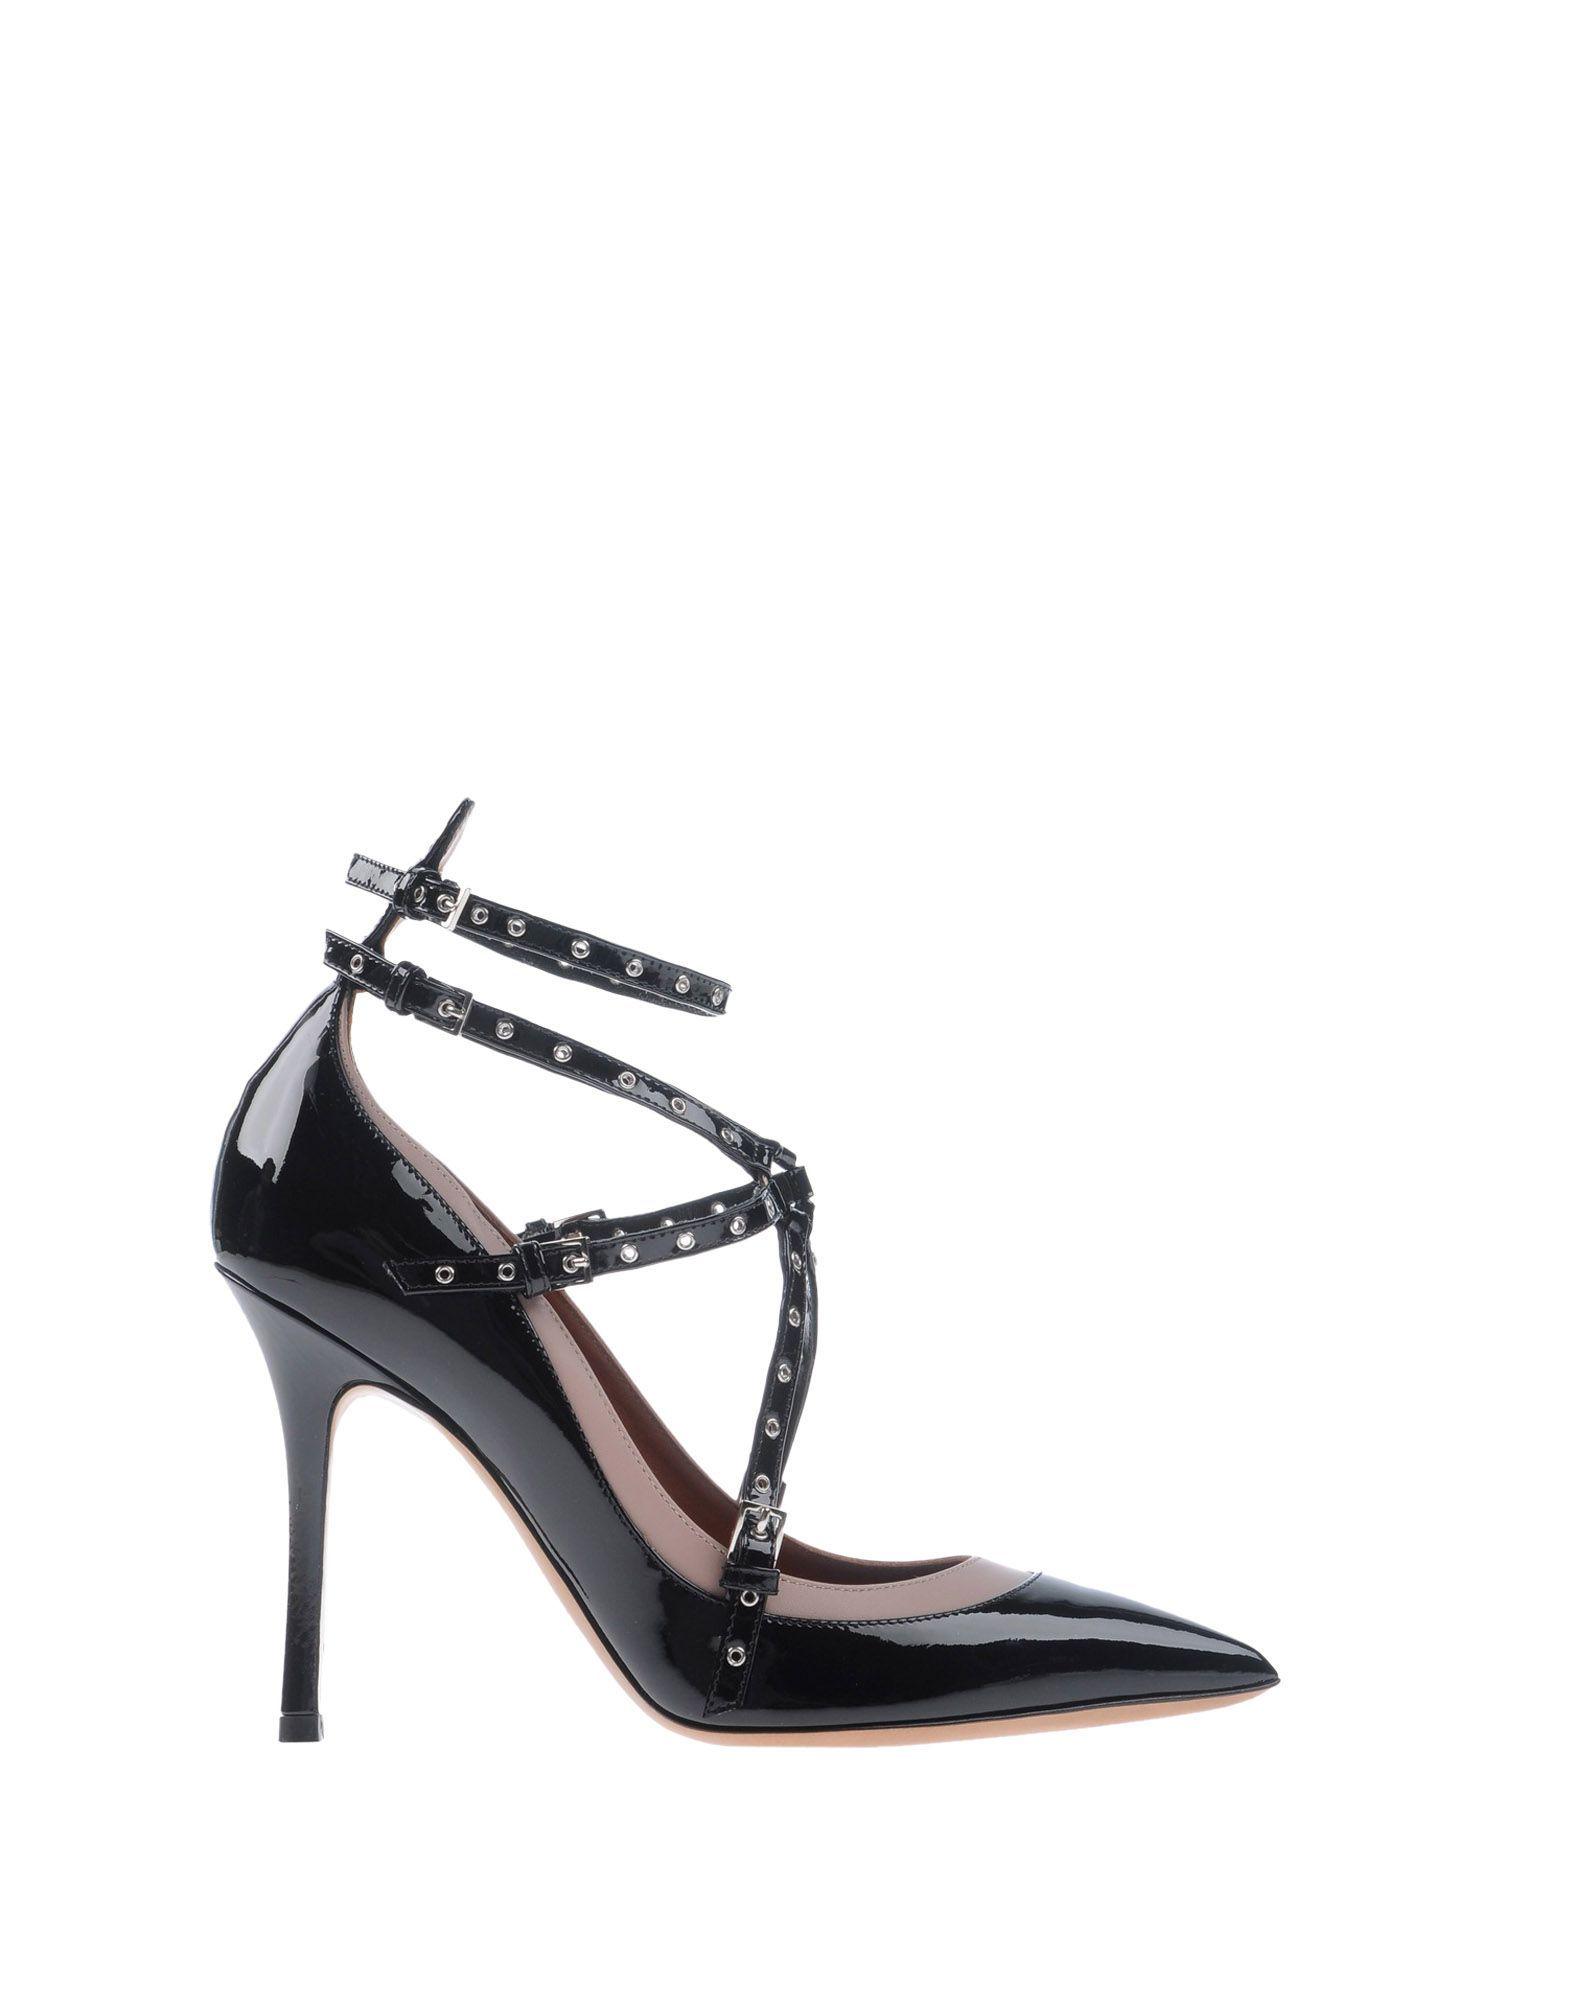 FOOTWEAR Valentino Garavani Black Woman Leather